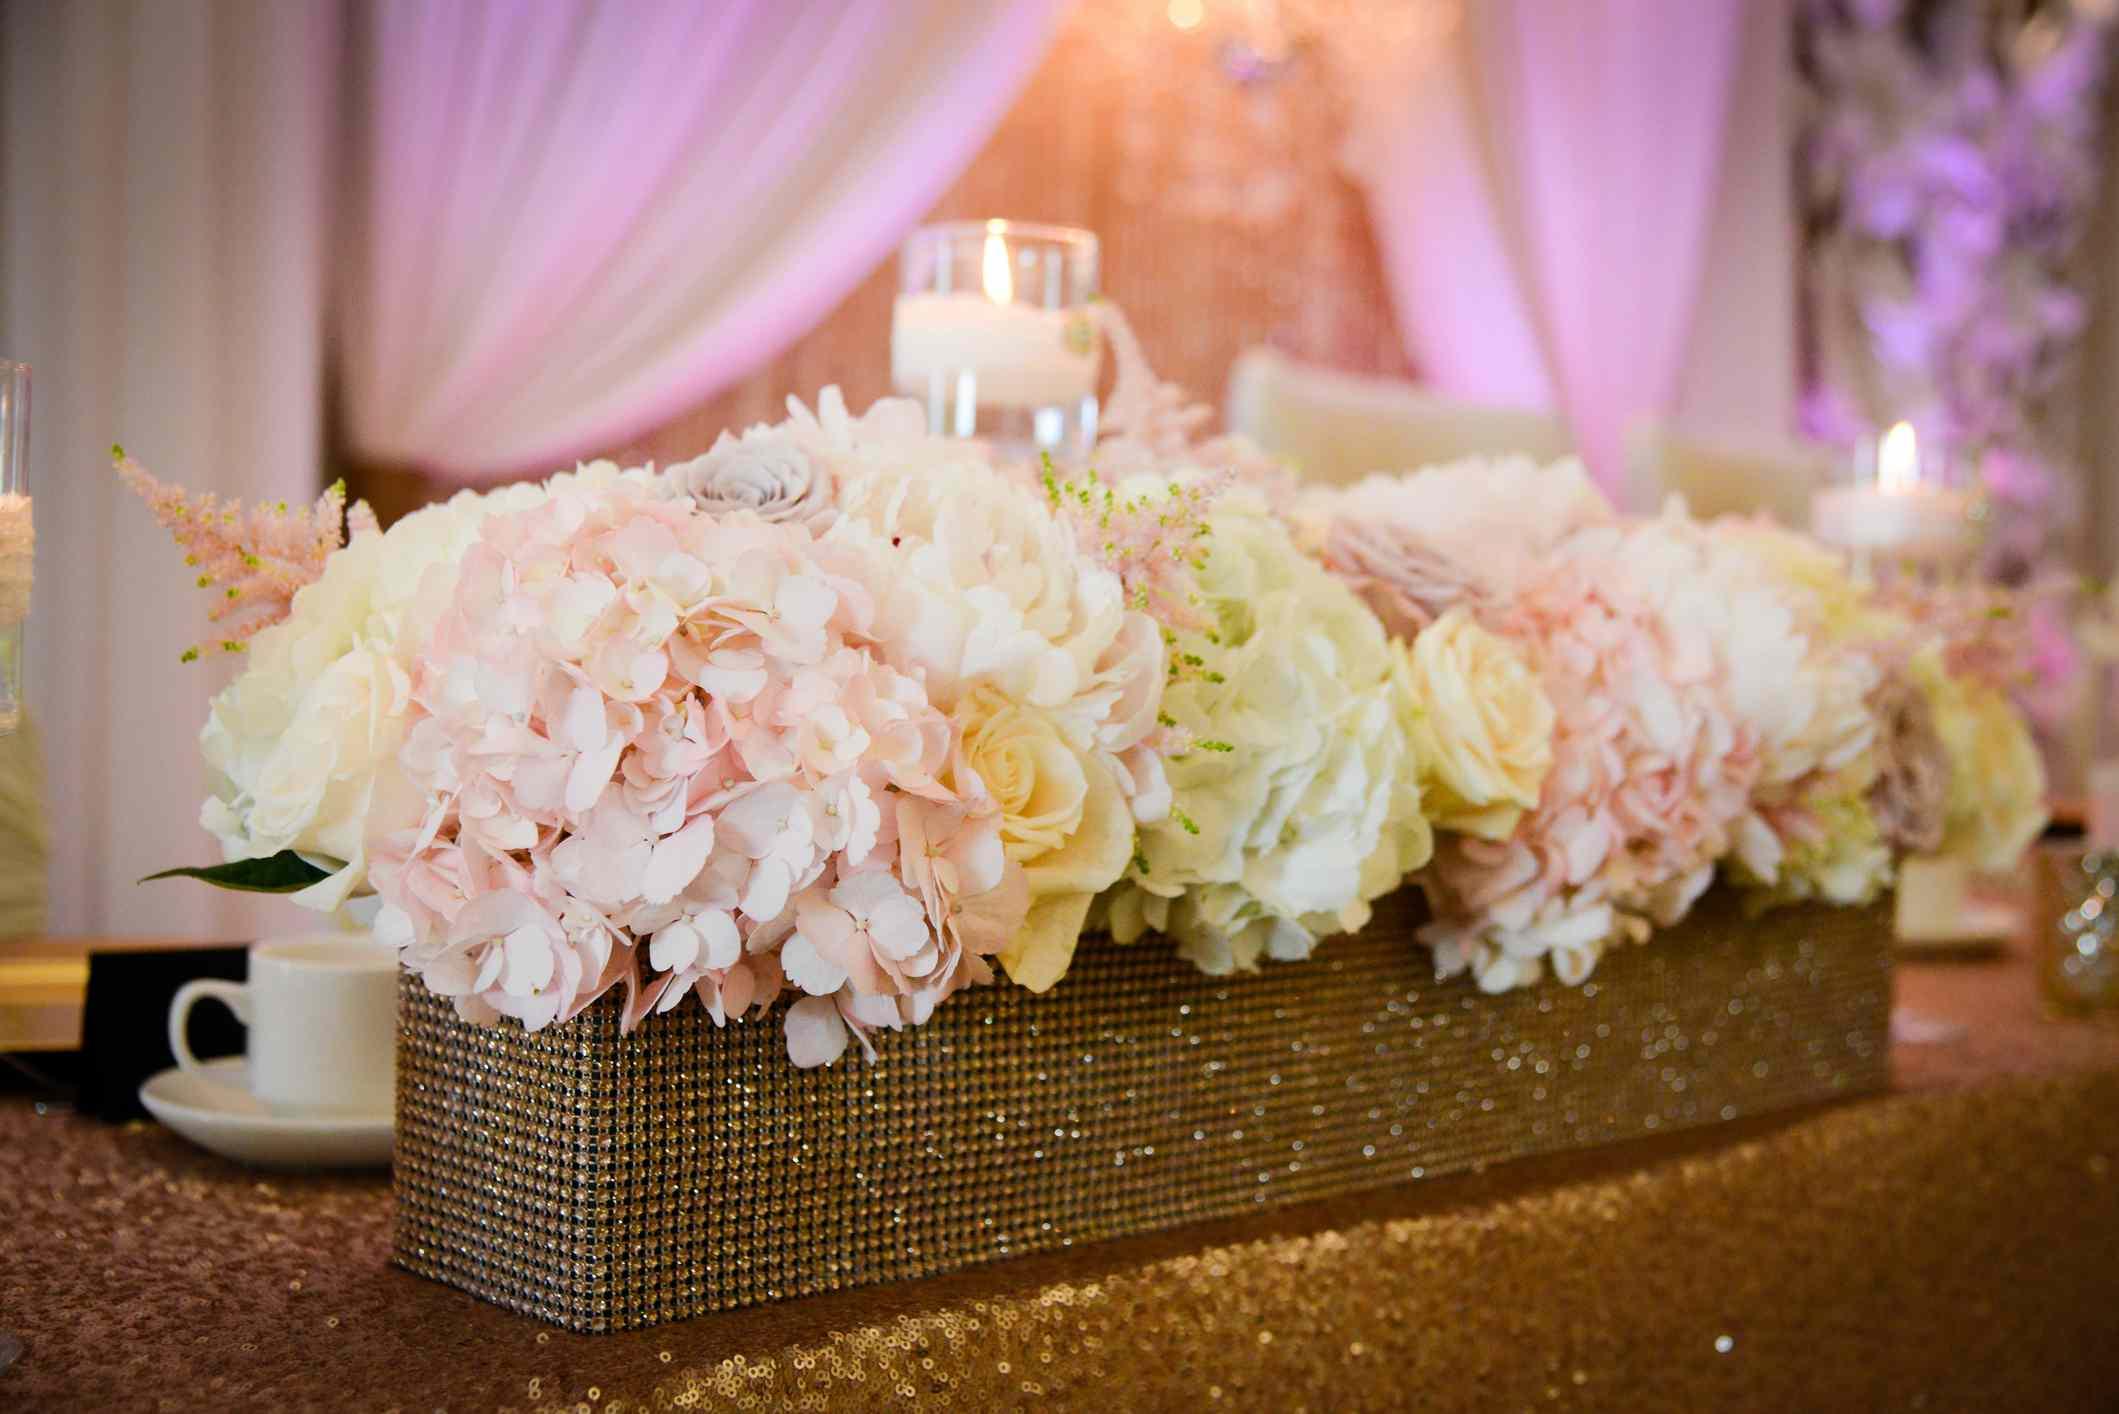 White and Pink Hydrangea centrepiece